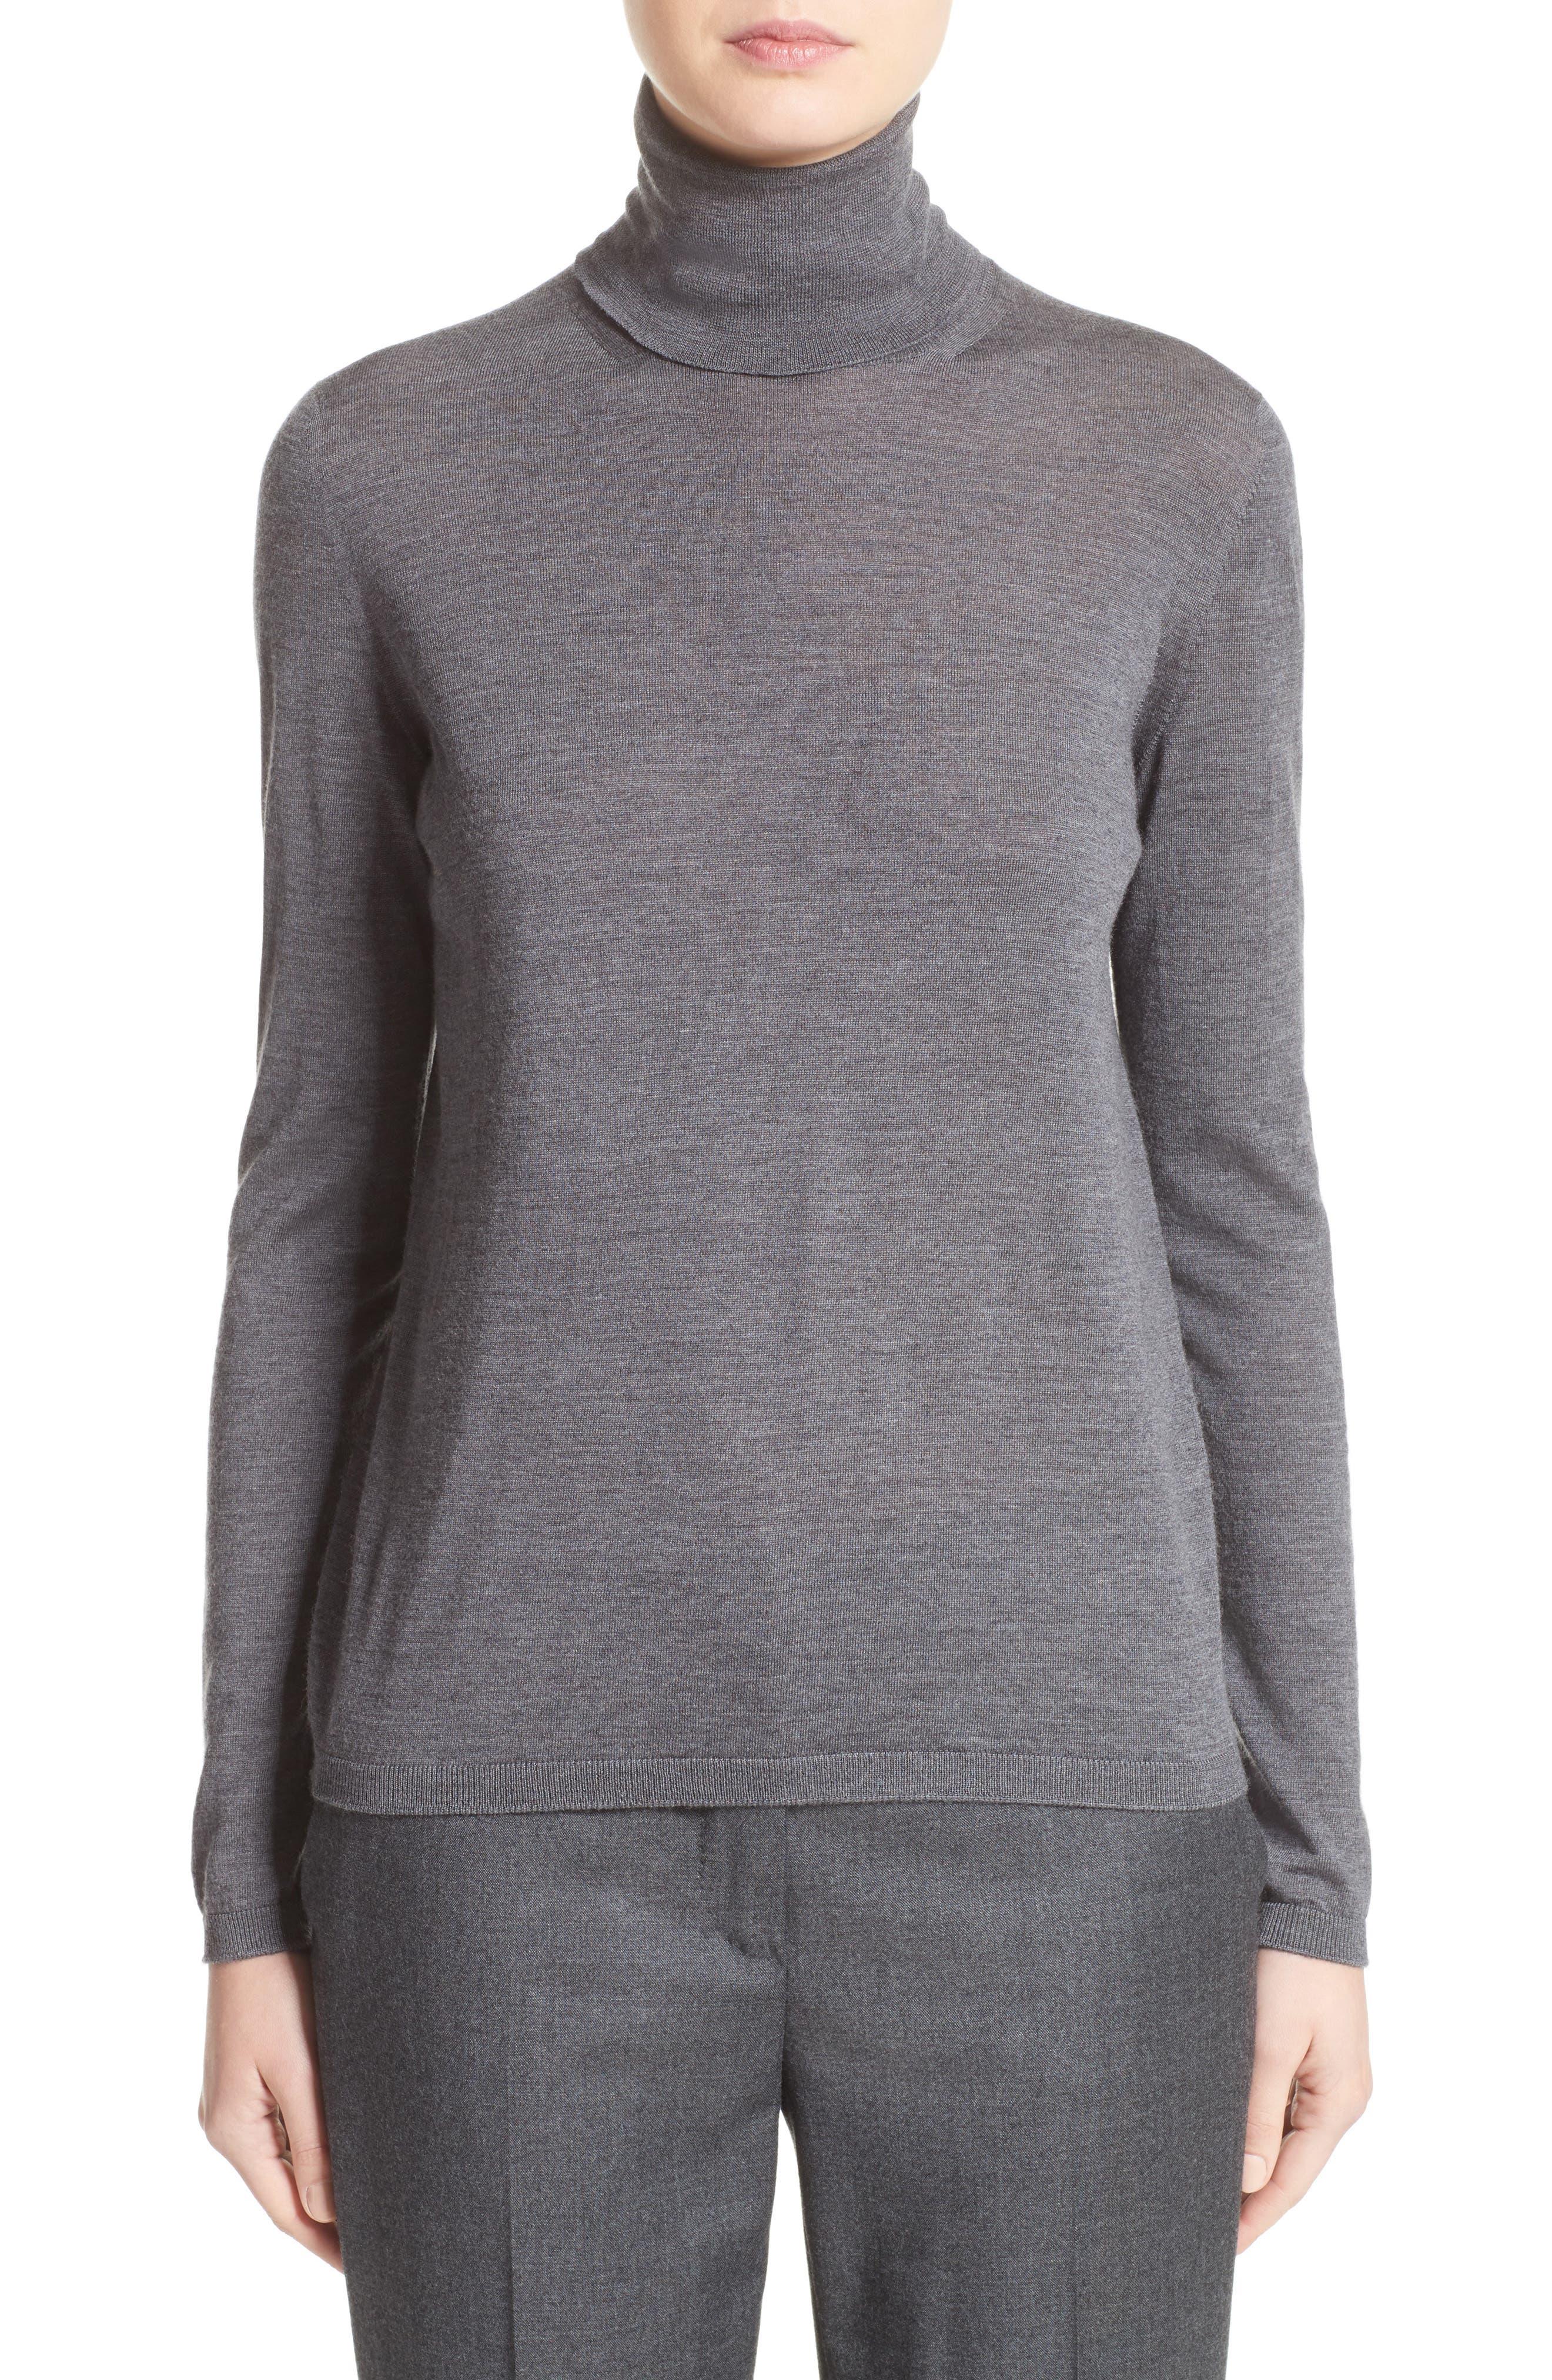 Virgin Wool Turtleneck,                         Main,                         color, Dark Grey